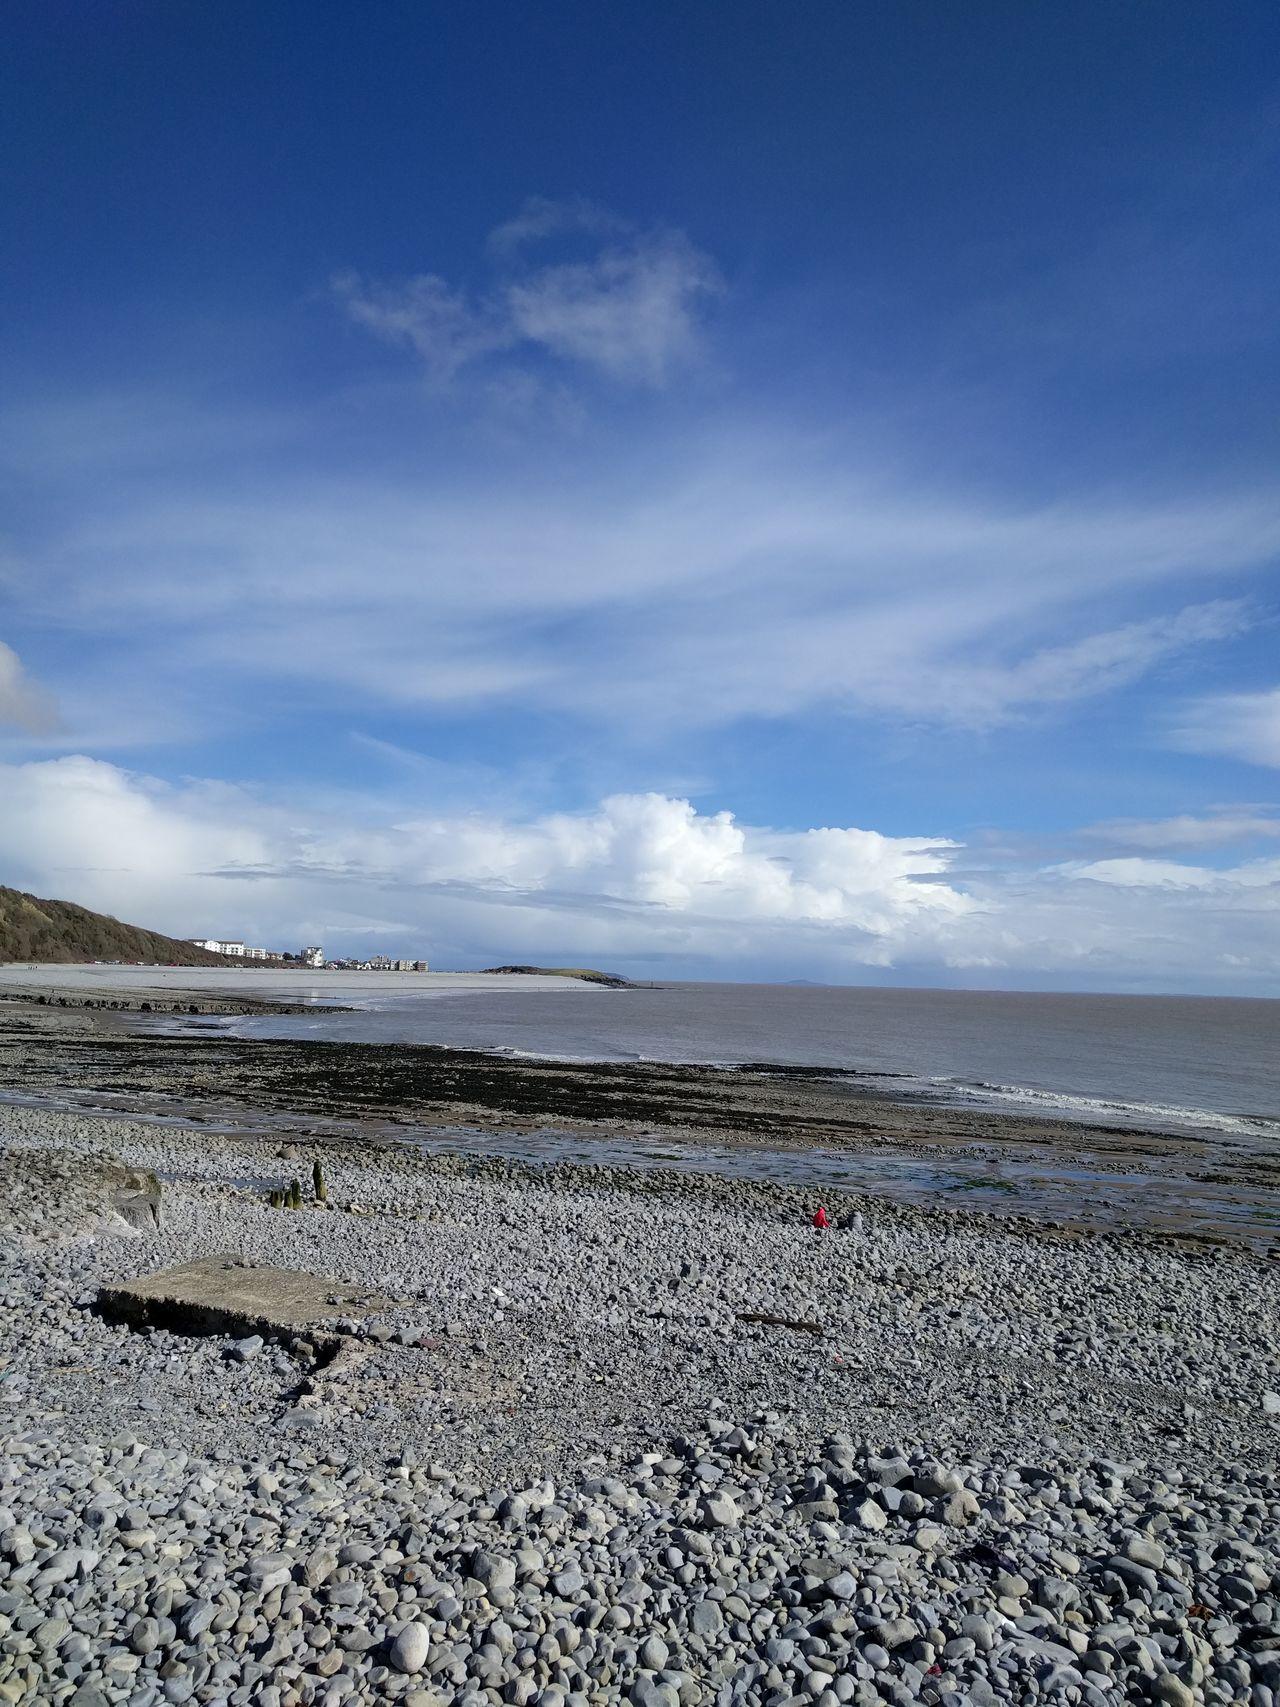 South Wales Coast Wales Sea Walking Around Coastline